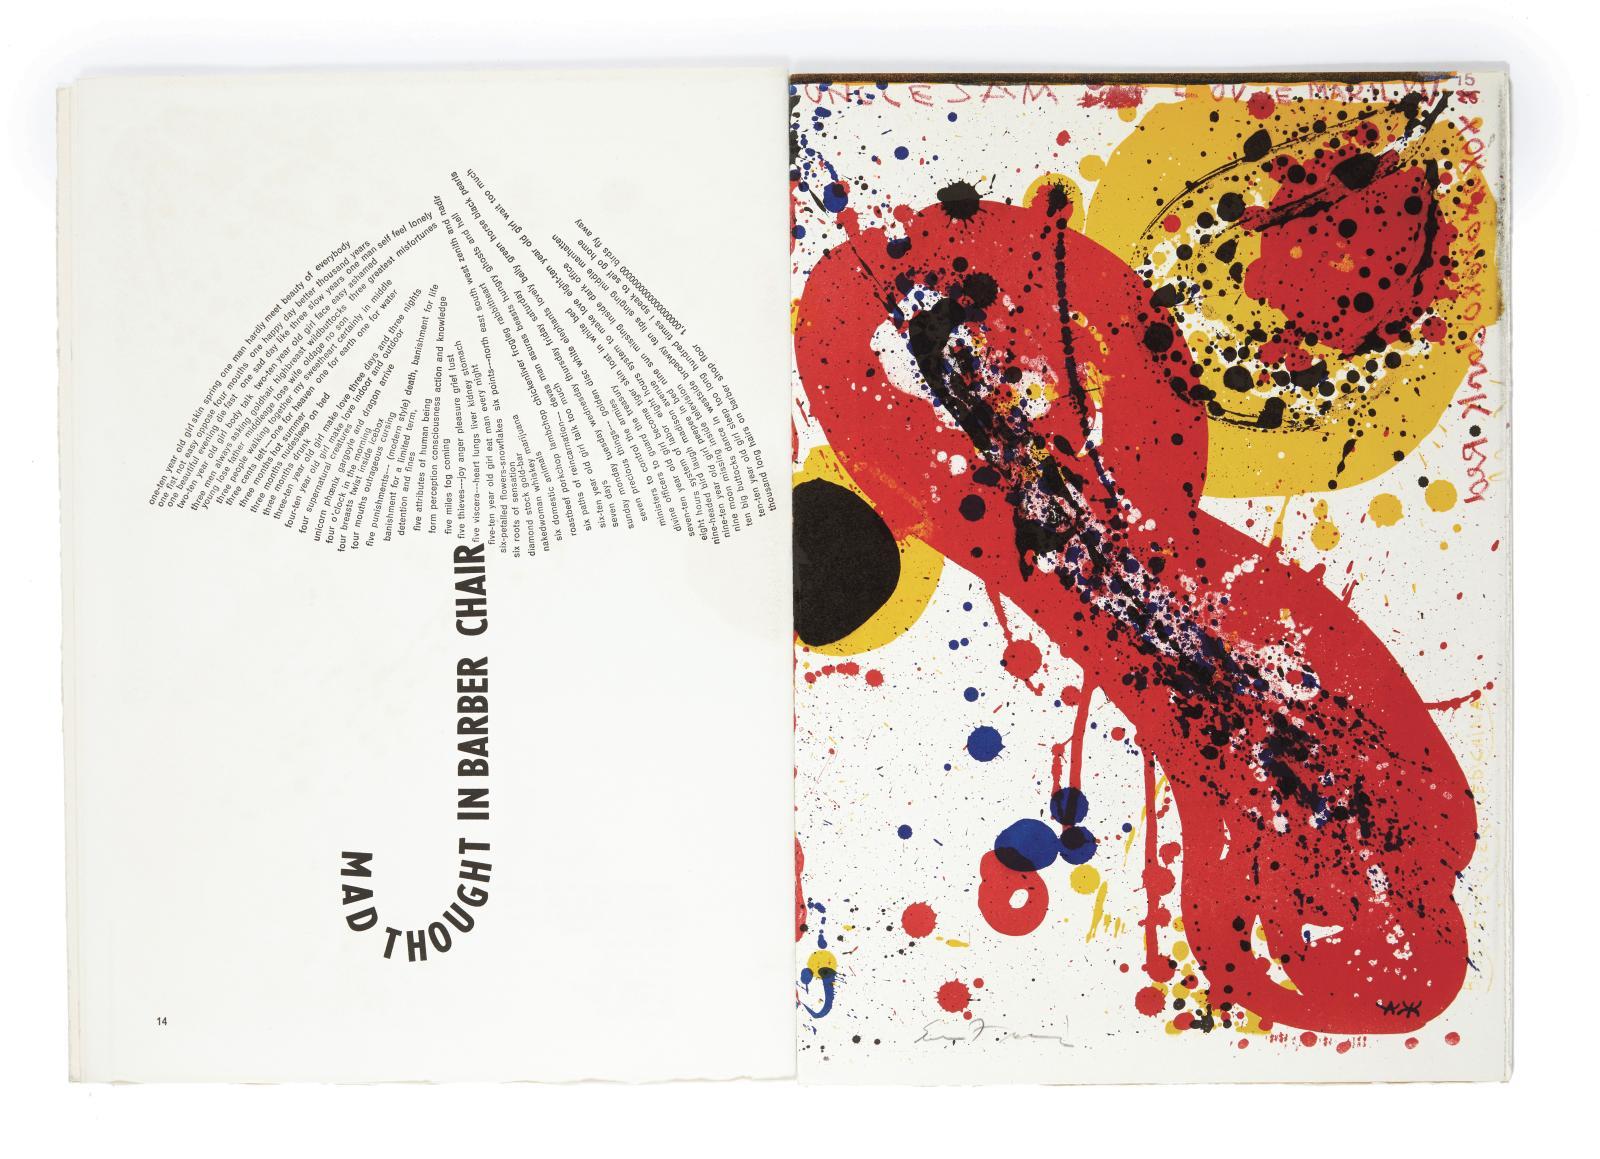 Ding Xiongquan,dit Walasse Ting(1929-2010), 1Life, Paris, [Maurice Beaudetpour les lithographies et Georges Girard pour la typographie